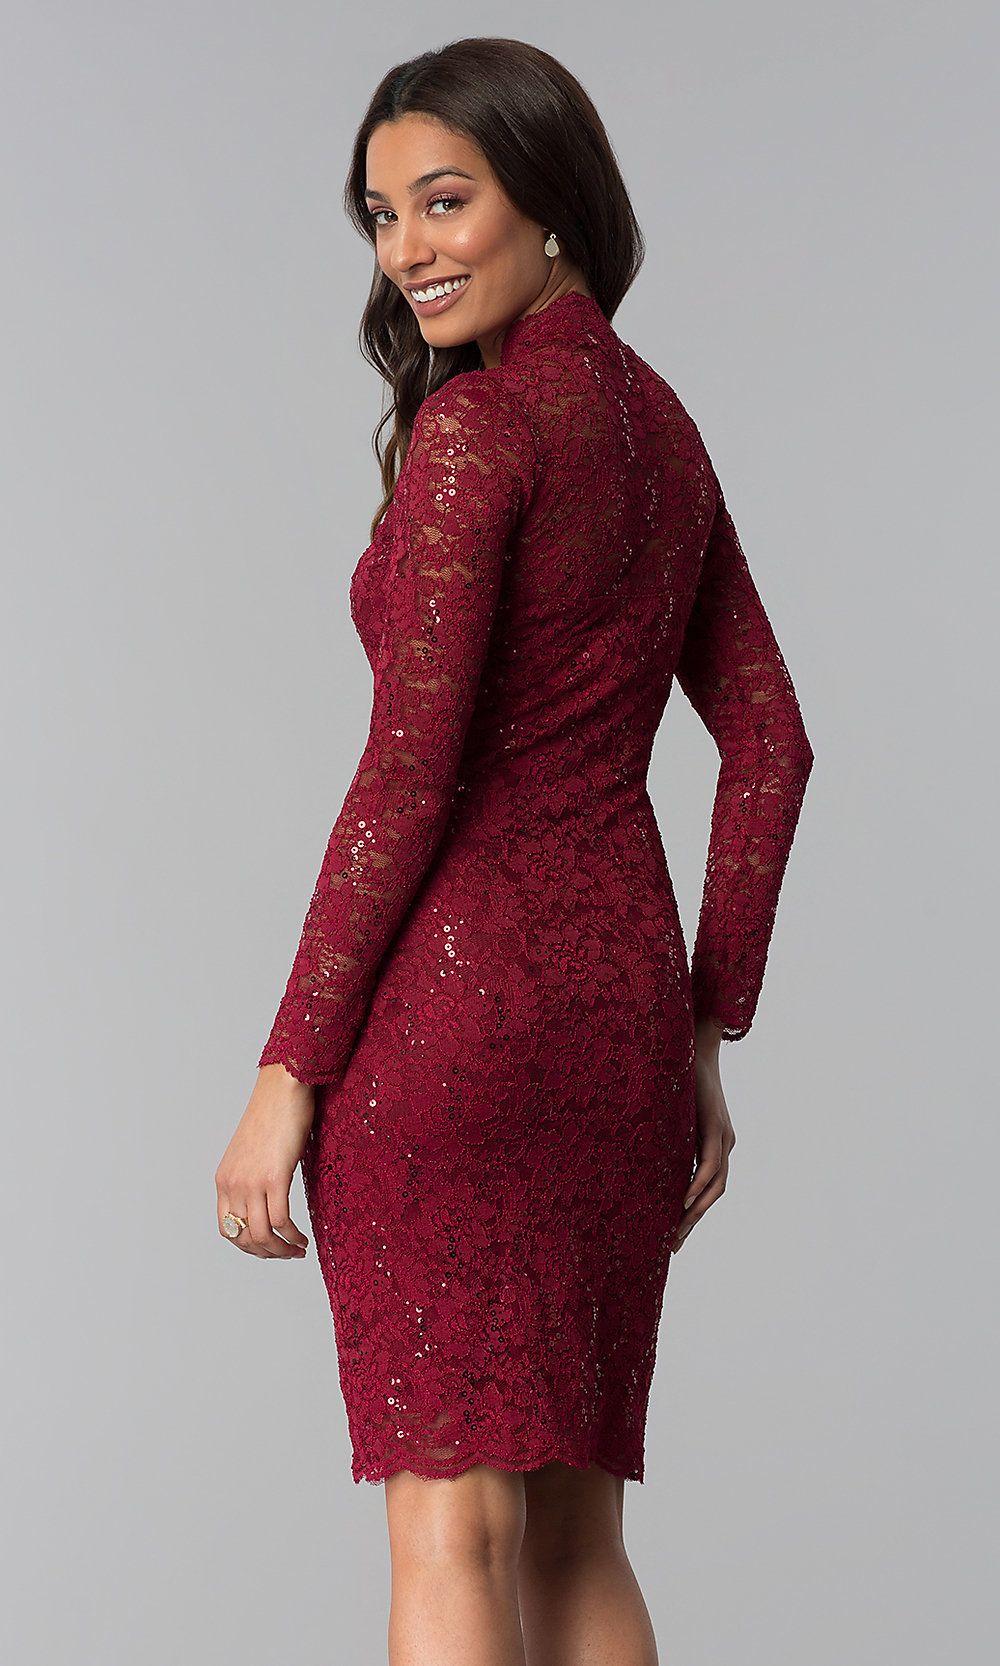 Long Sleeve Knee Length Lace Wedding Guest Dress Lace Wedding Guest Dress Wedding Guest Dress Guest Dresses [ 1666 x 1000 Pixel ]